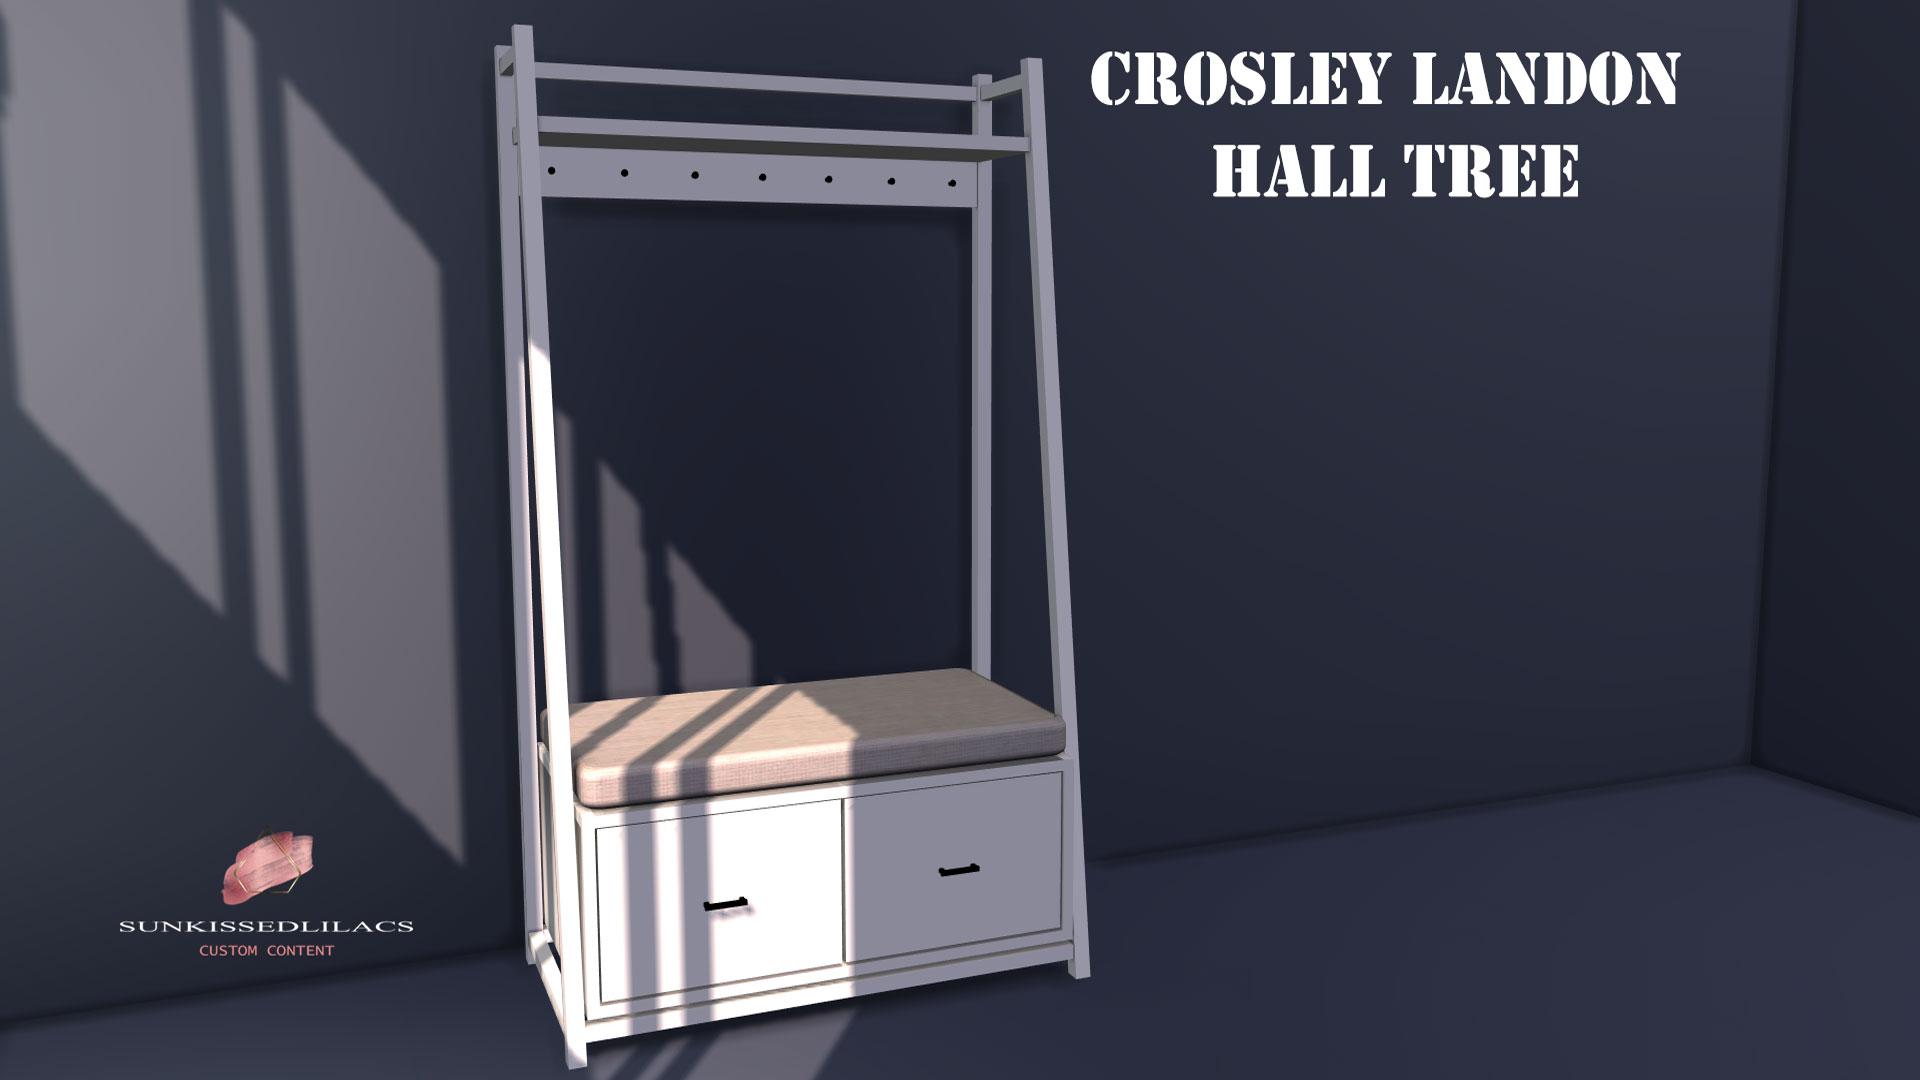 Crosley Landon Hall Tree, sunkissedlilacs-simms-4-custom-content